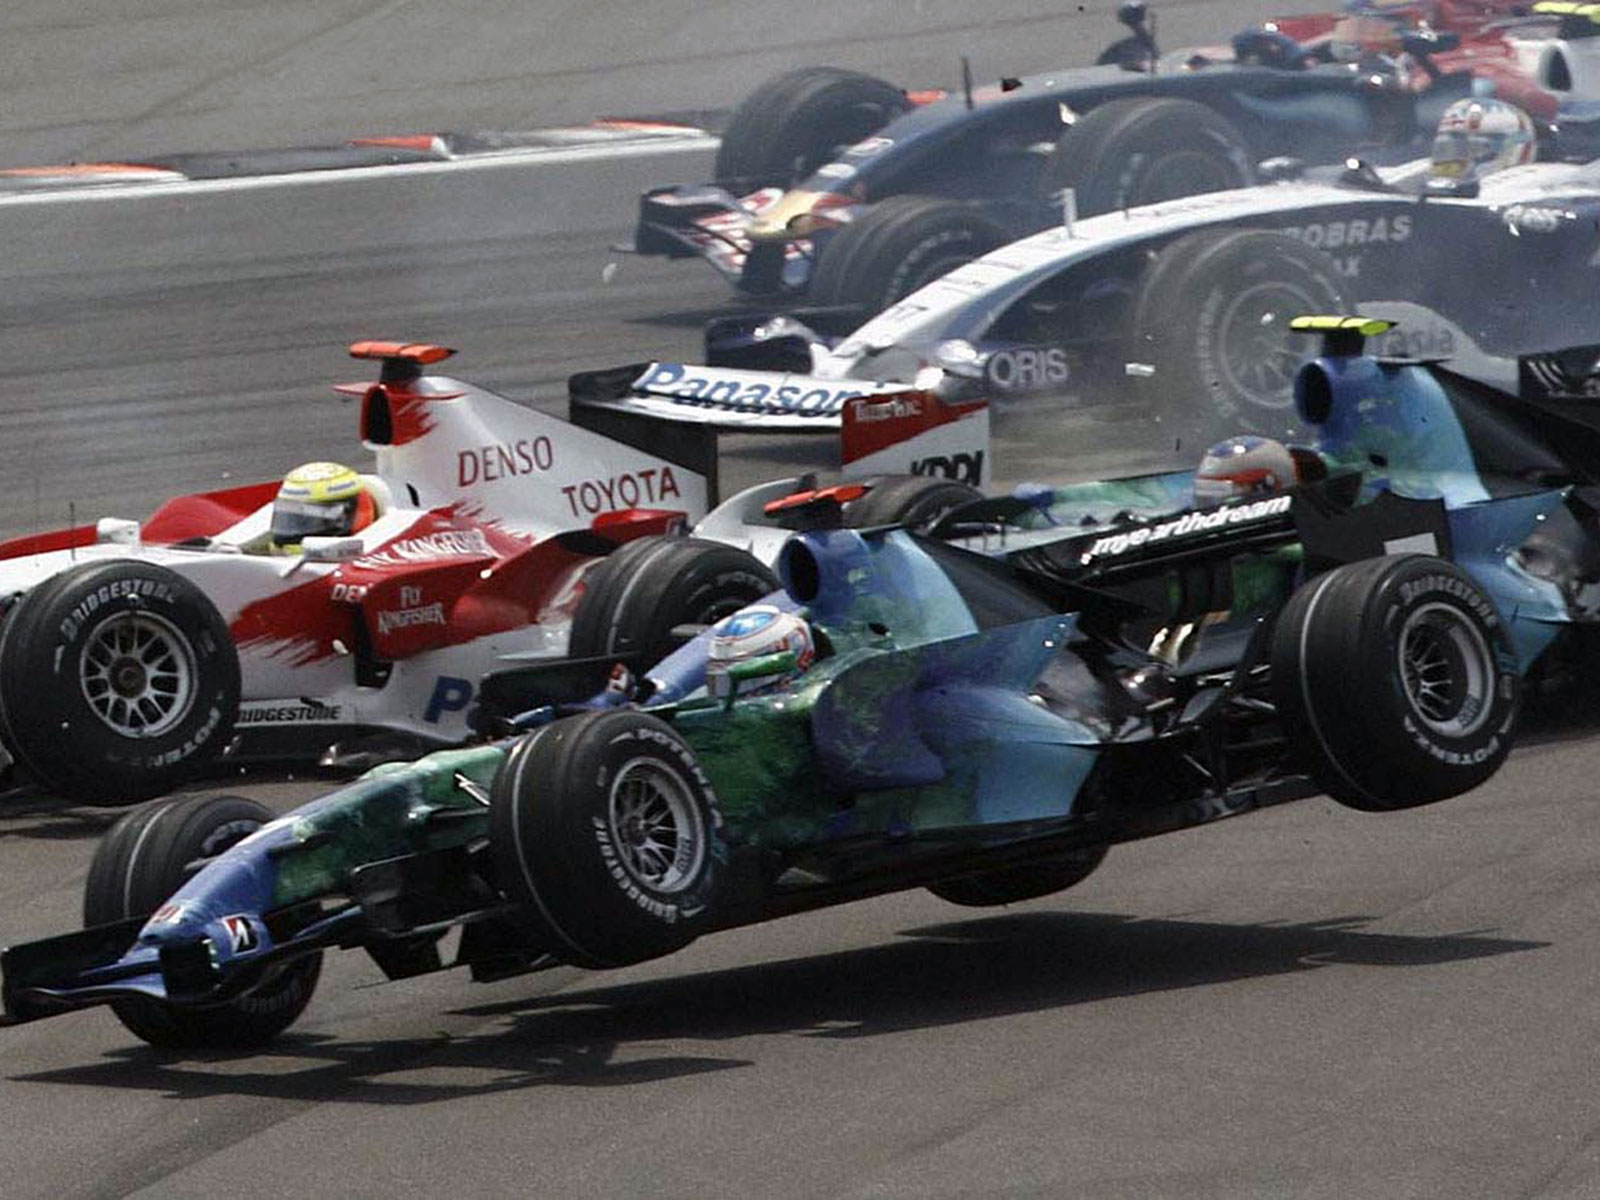 Hd Wallpapers 2007 Formula 1 Grand Prix Of Usa F1